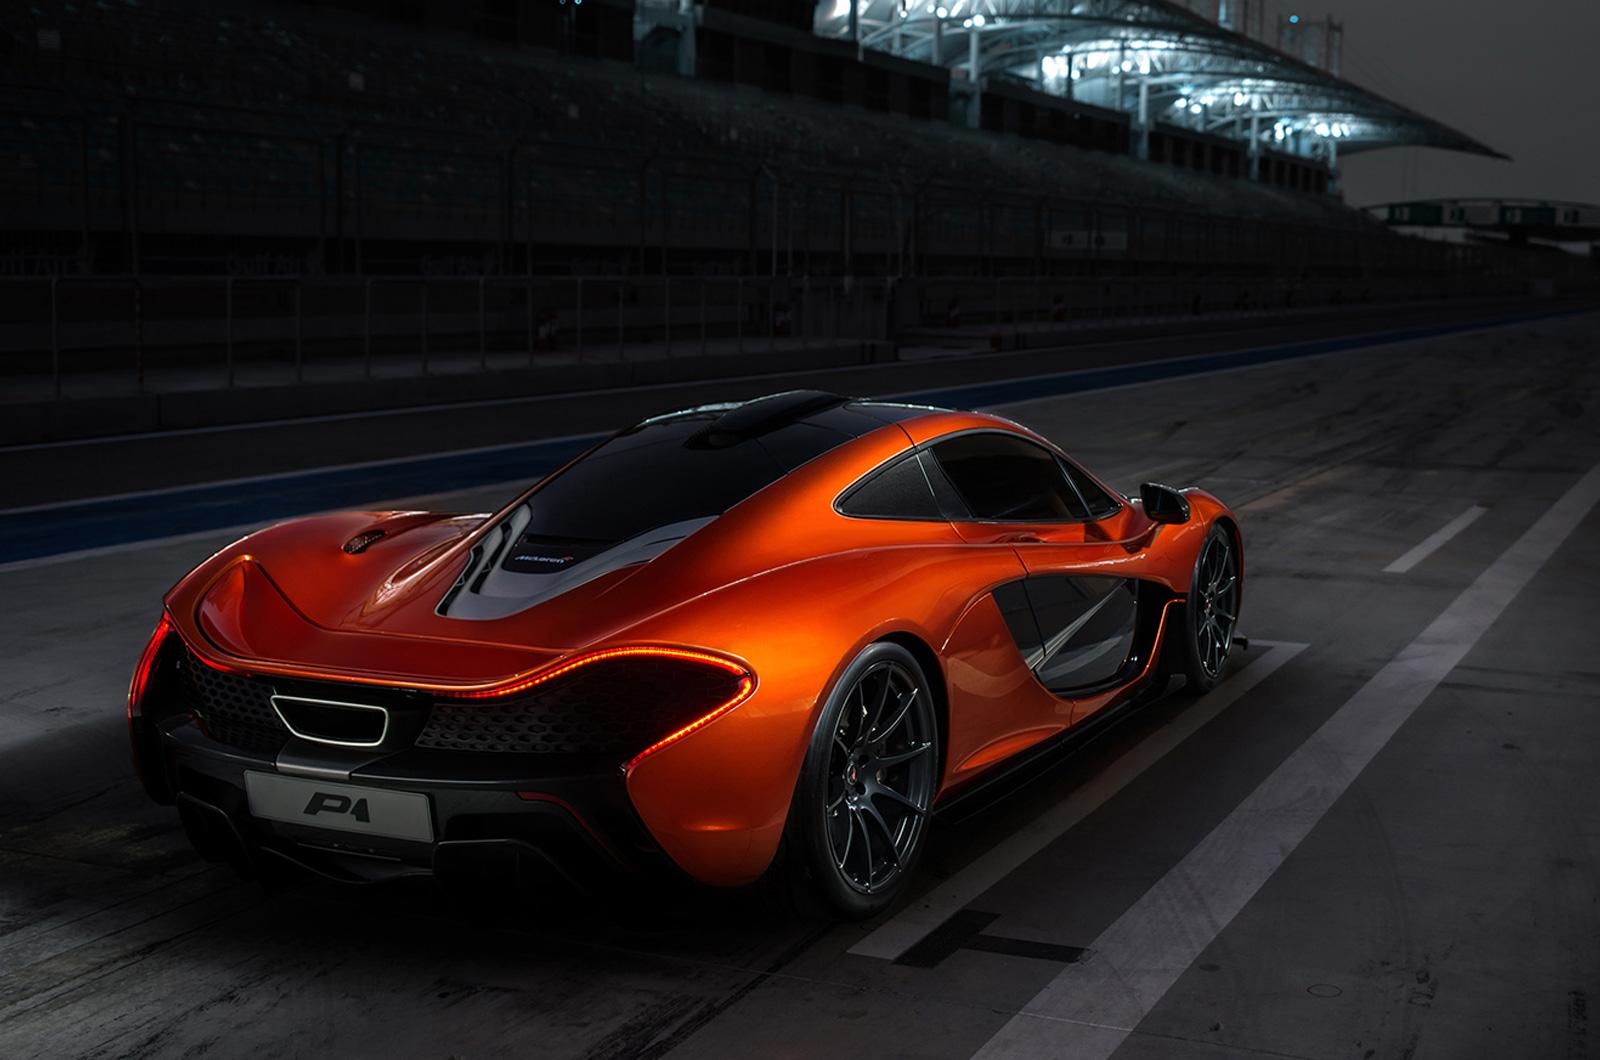 New McLaren P1, 2014 McLaren P1, McLaren P1 specs, McLaren P1 design, McLaren P1 features, McLaren P1 price, McLaren P1 launch date, McLaren P1 images,